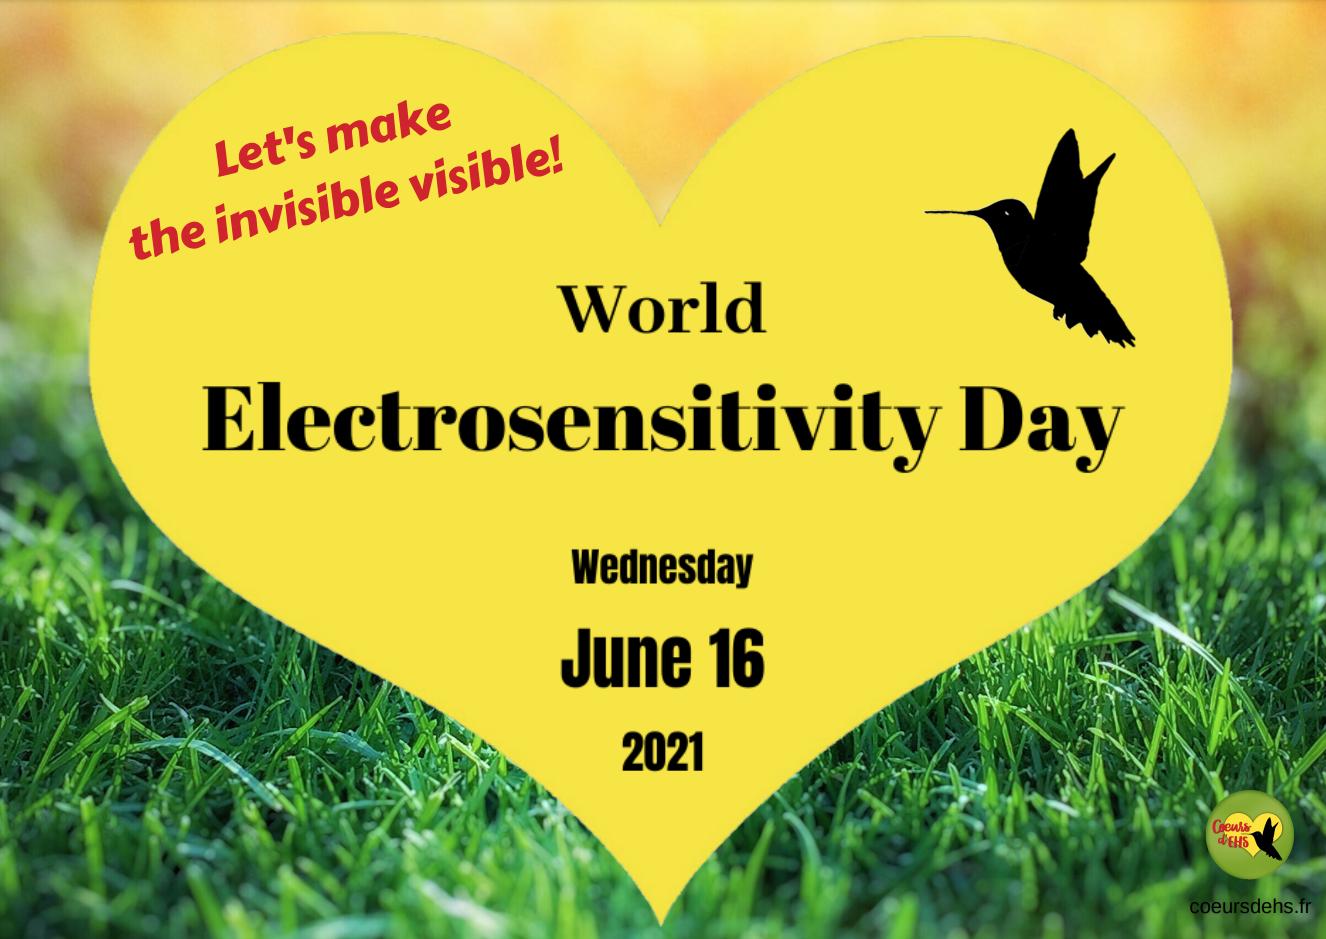 World Electrosensitivity Day